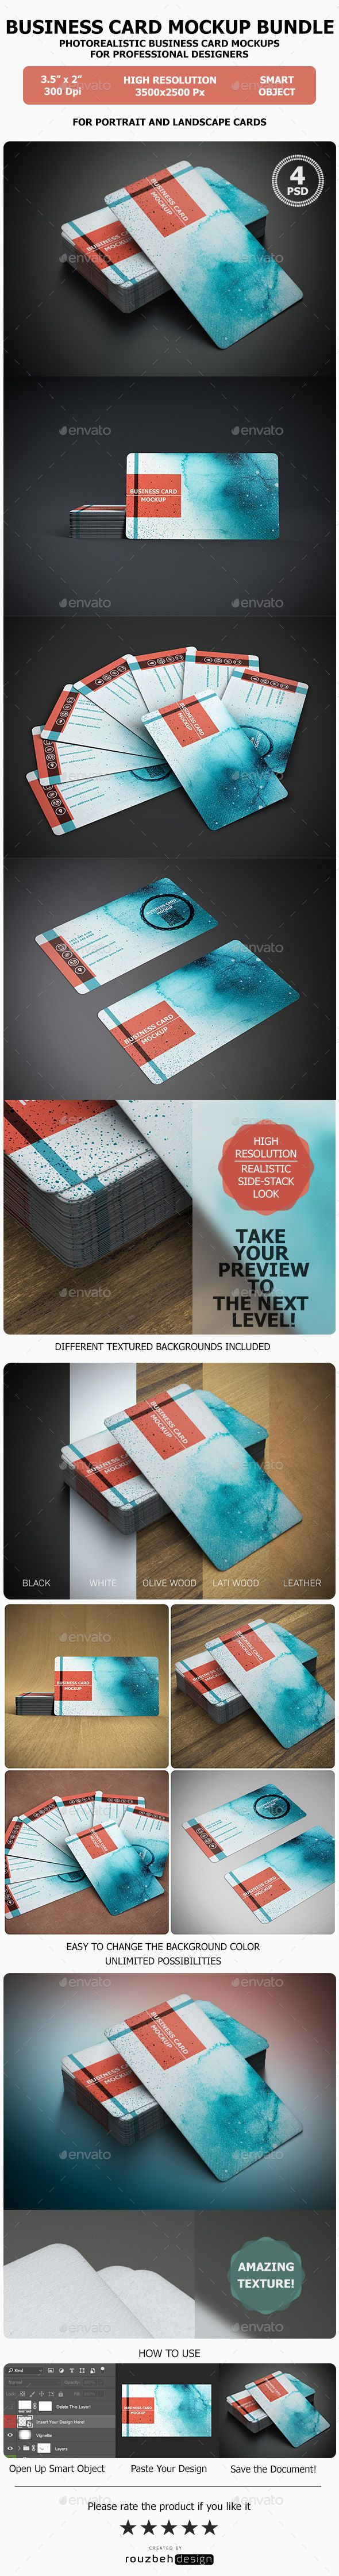 Realistic business card mock up bundle business cards mockup and realistic business card mock up bundle reheart Images